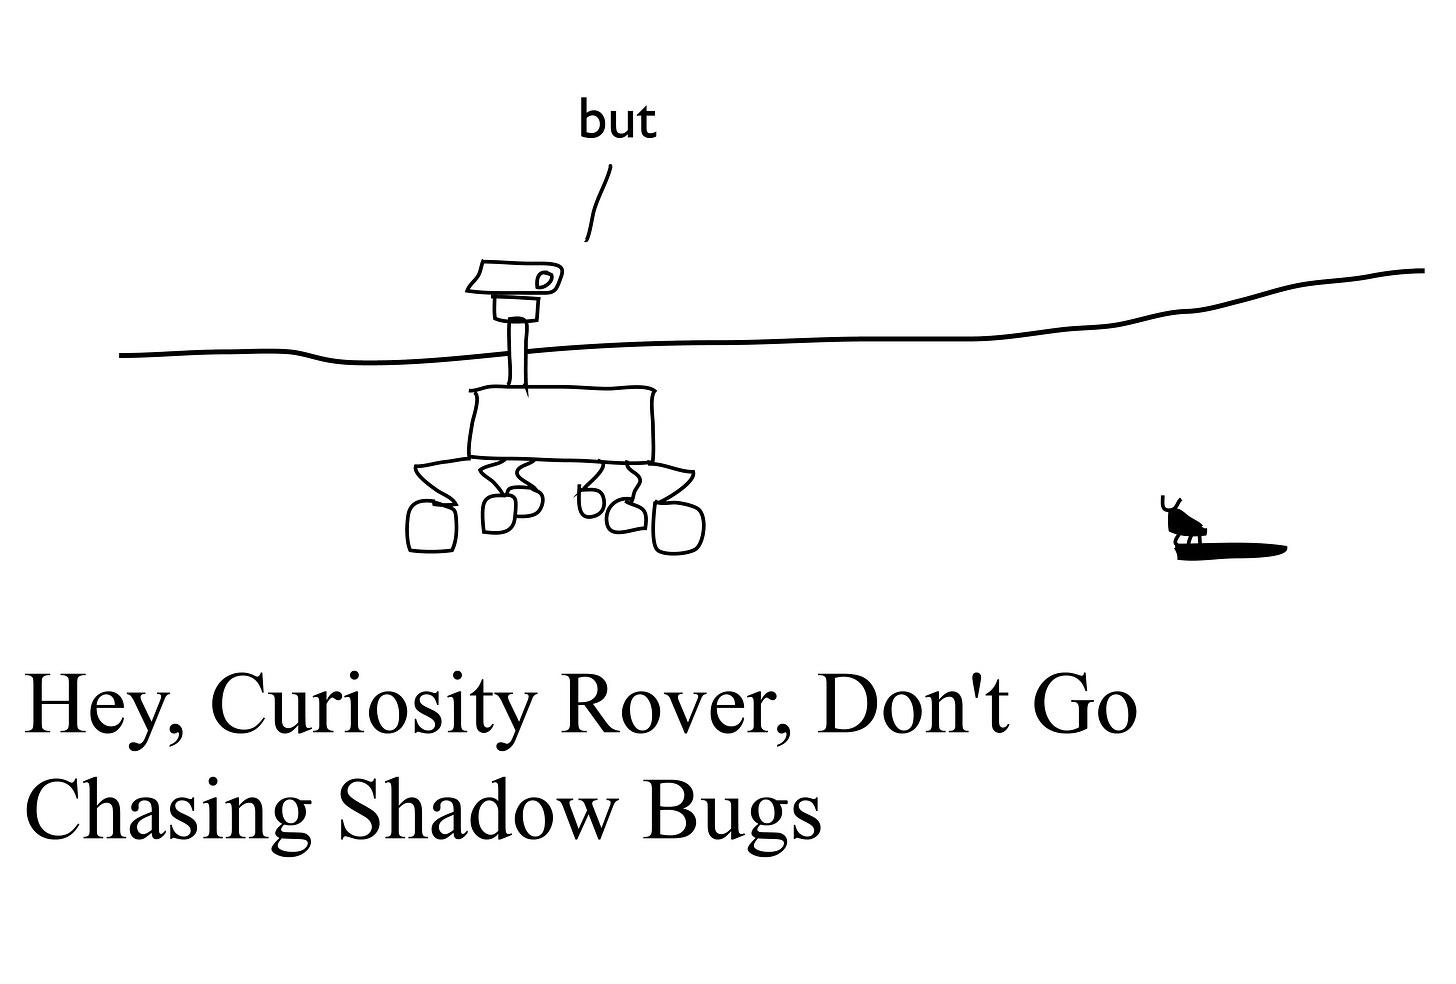 Hey, Curiosity Rover, Don't Go Chasing Shadow Bugs